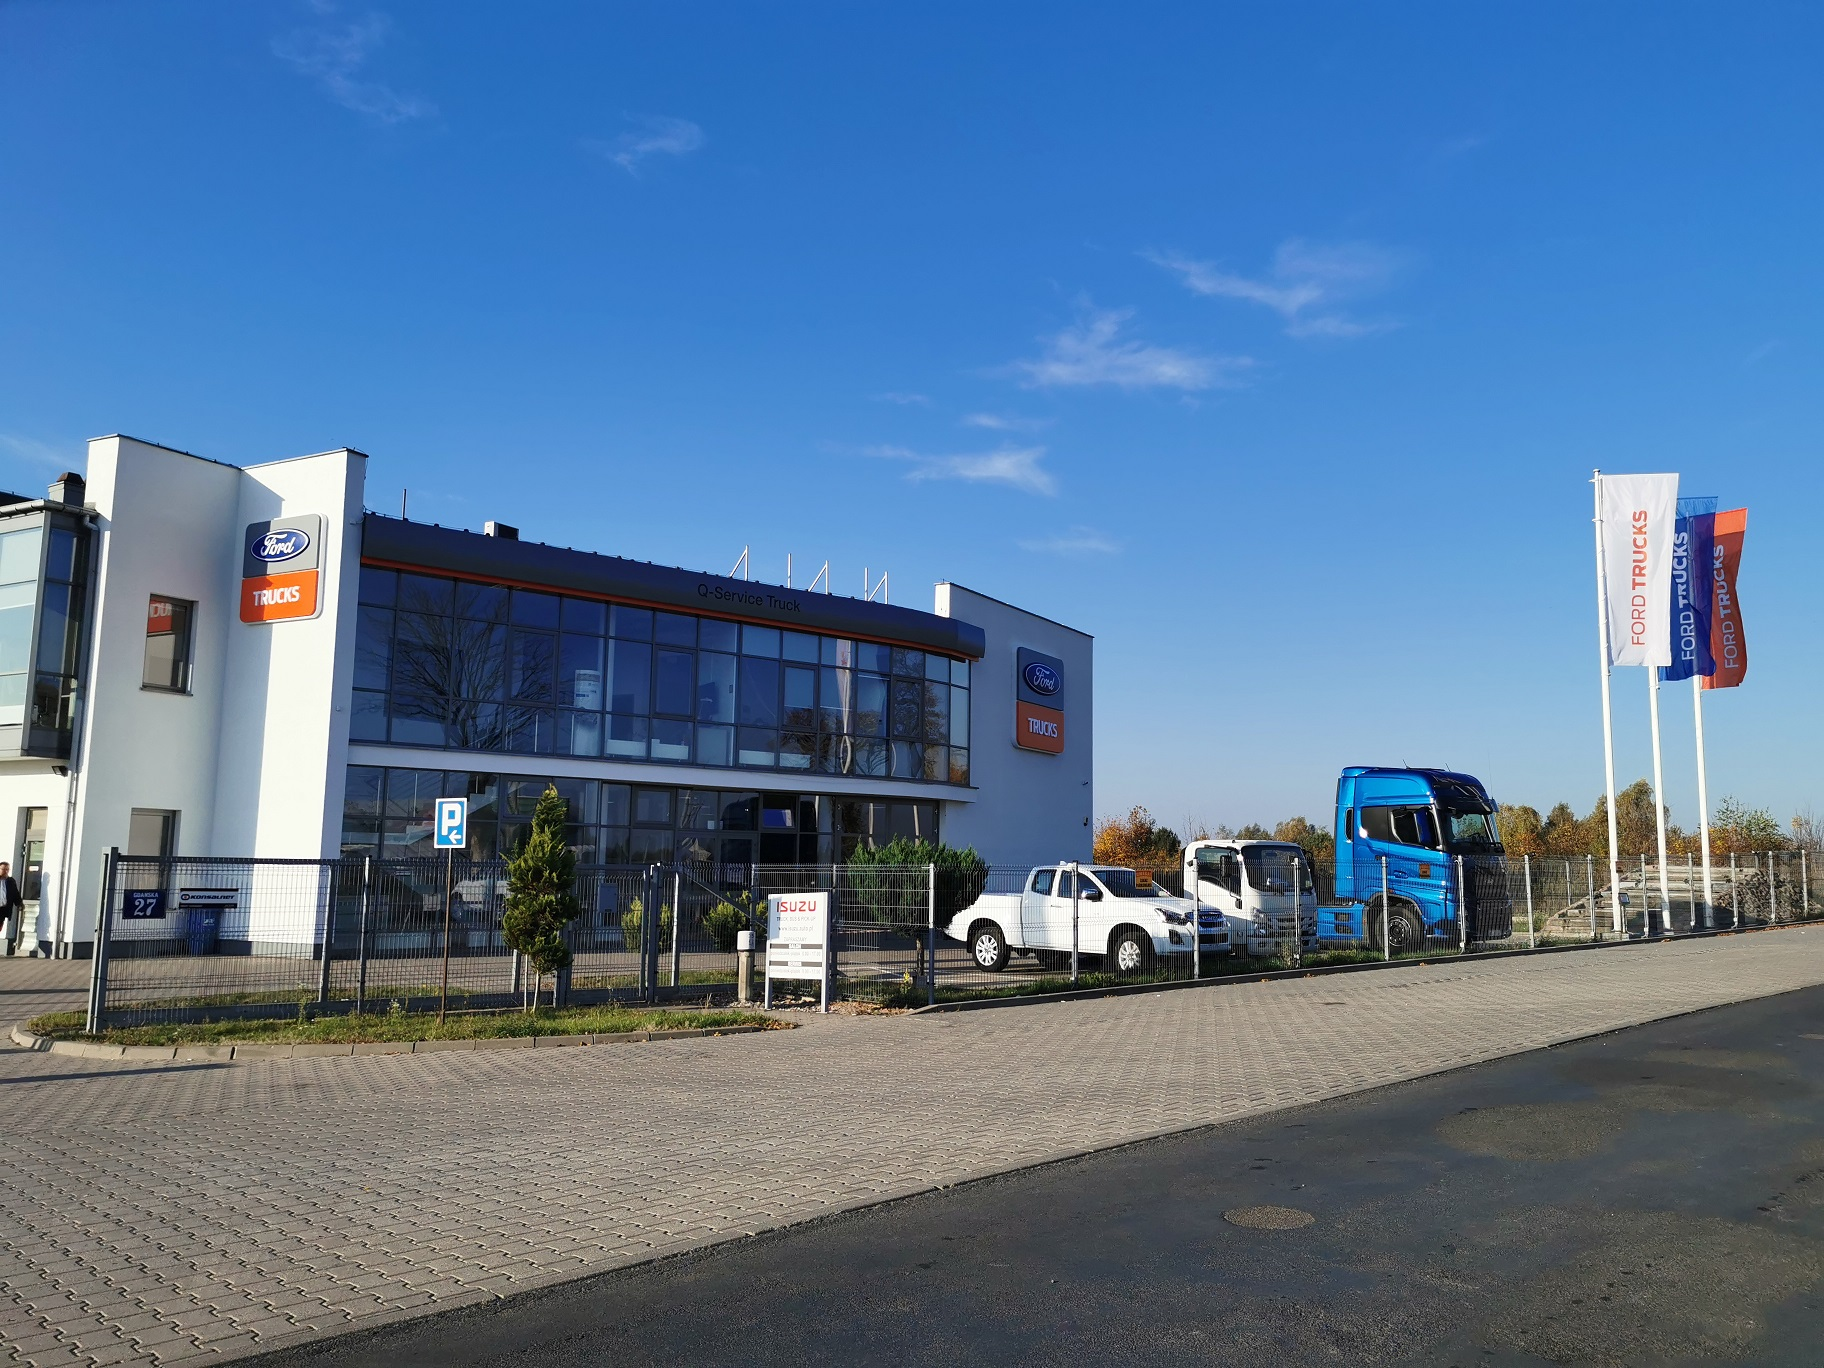 ford-trucks-polonya-tesis.jpg